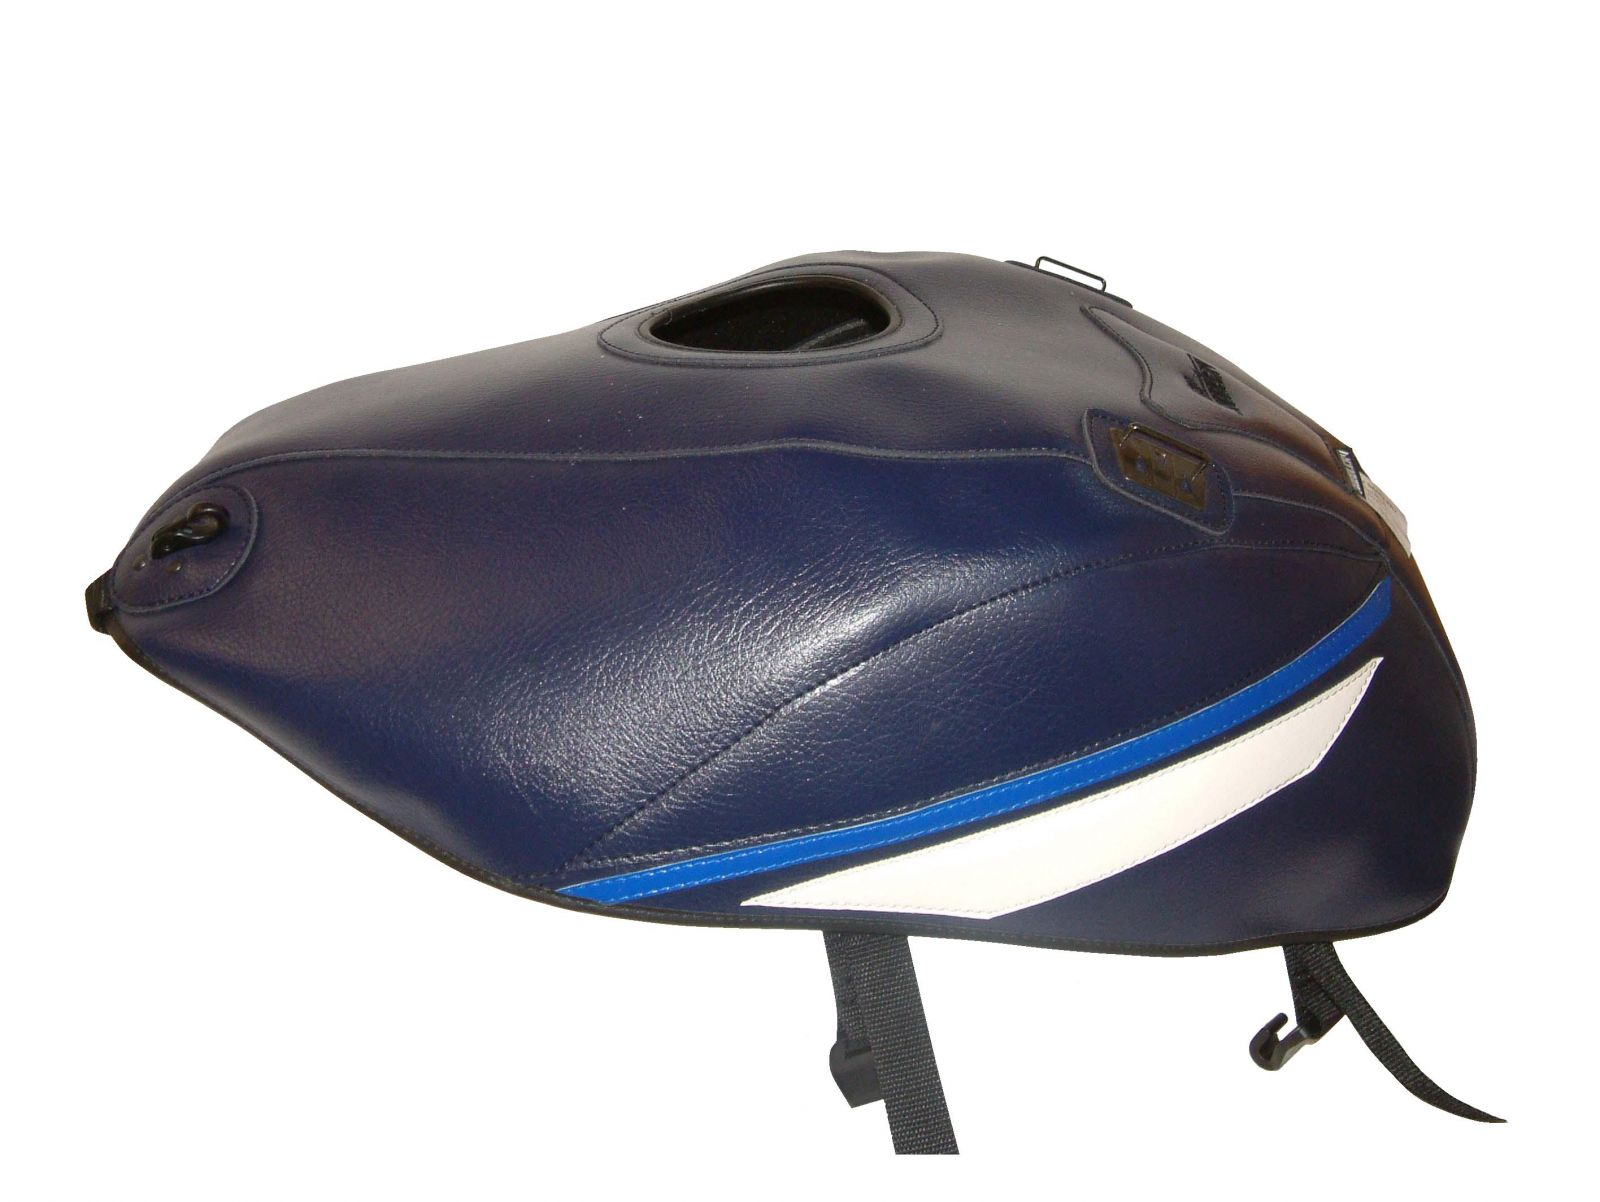 petrol tank cover tpr4035 suzuki bandit 600 2000 2004. Black Bedroom Furniture Sets. Home Design Ideas